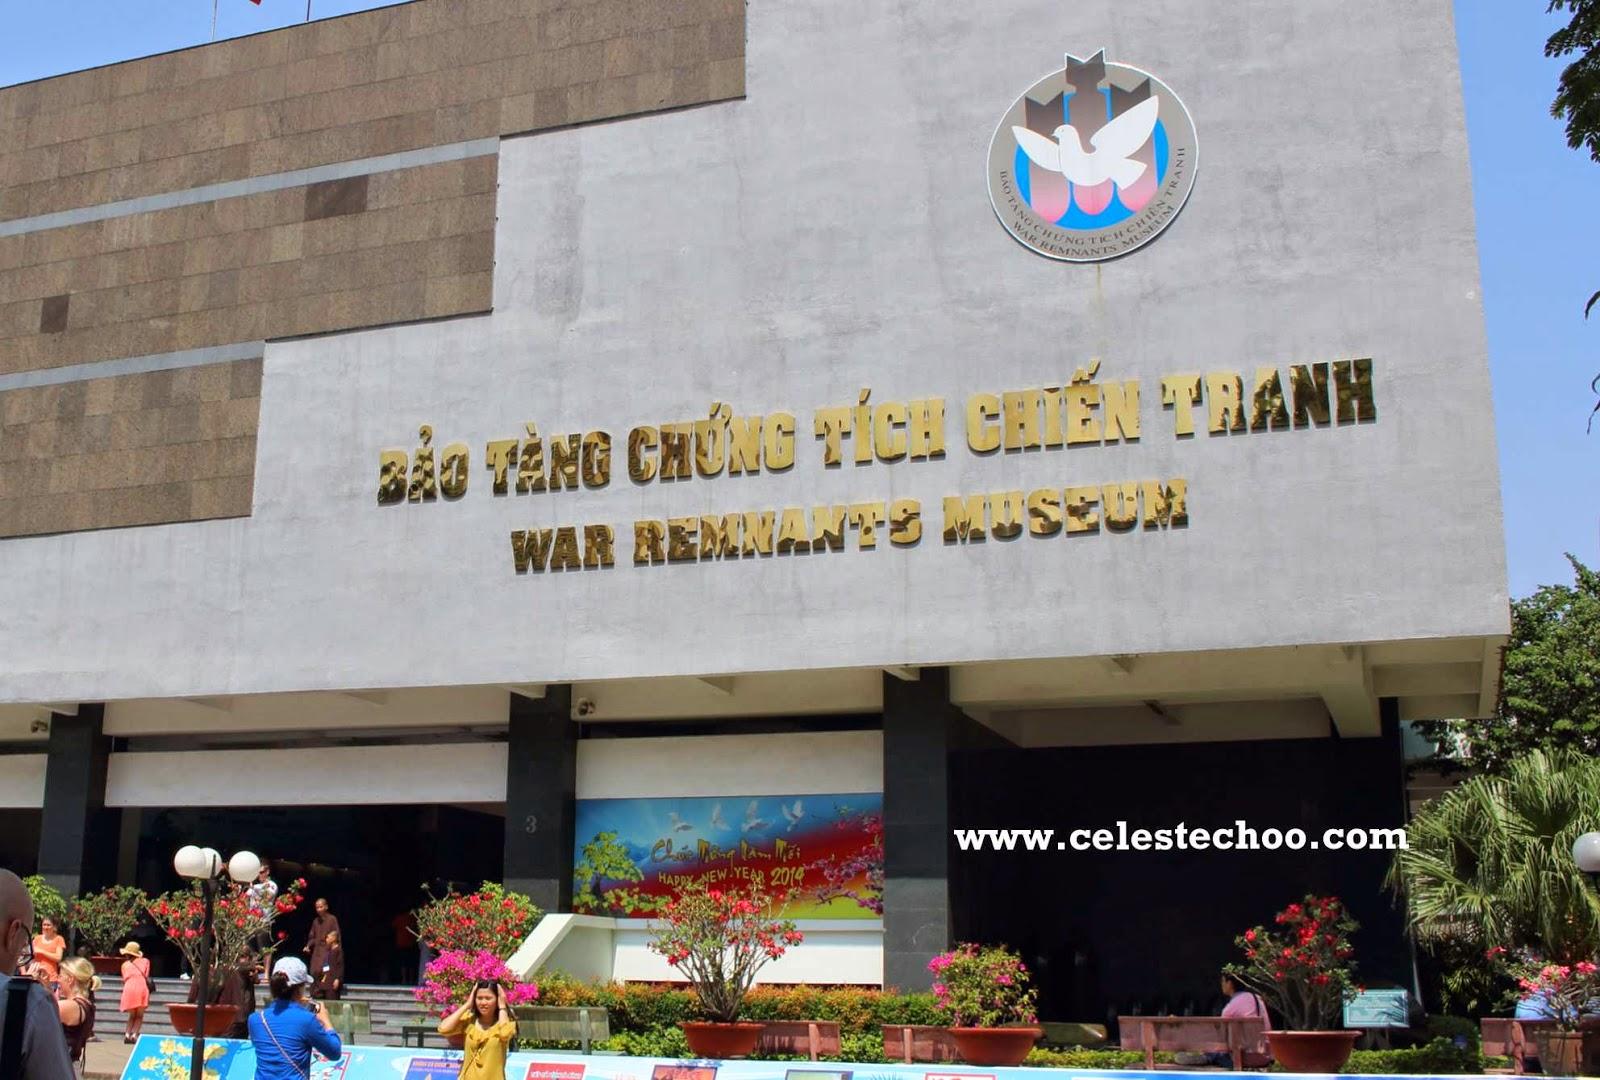 image-vietnam-ho-chi-minh-war-remnants-museum